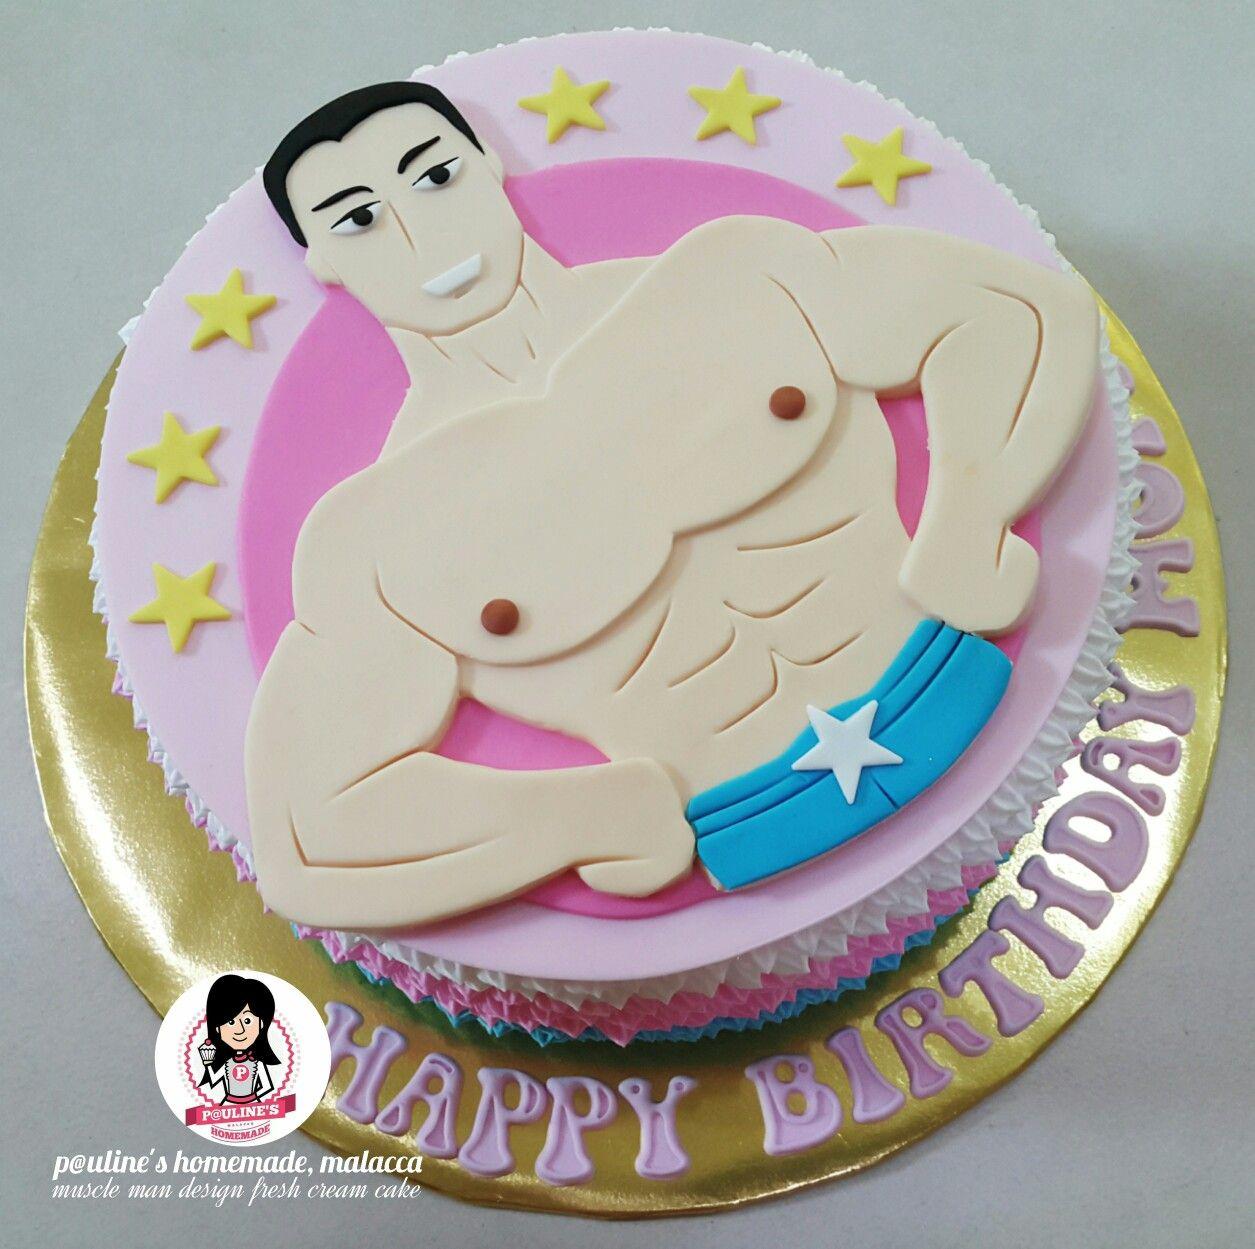 Pleasing Muscle Man Design Fresh Cream Cake Cakes For Men Cake Fresh Cream Personalised Birthday Cards Xaembasilily Jamesorg